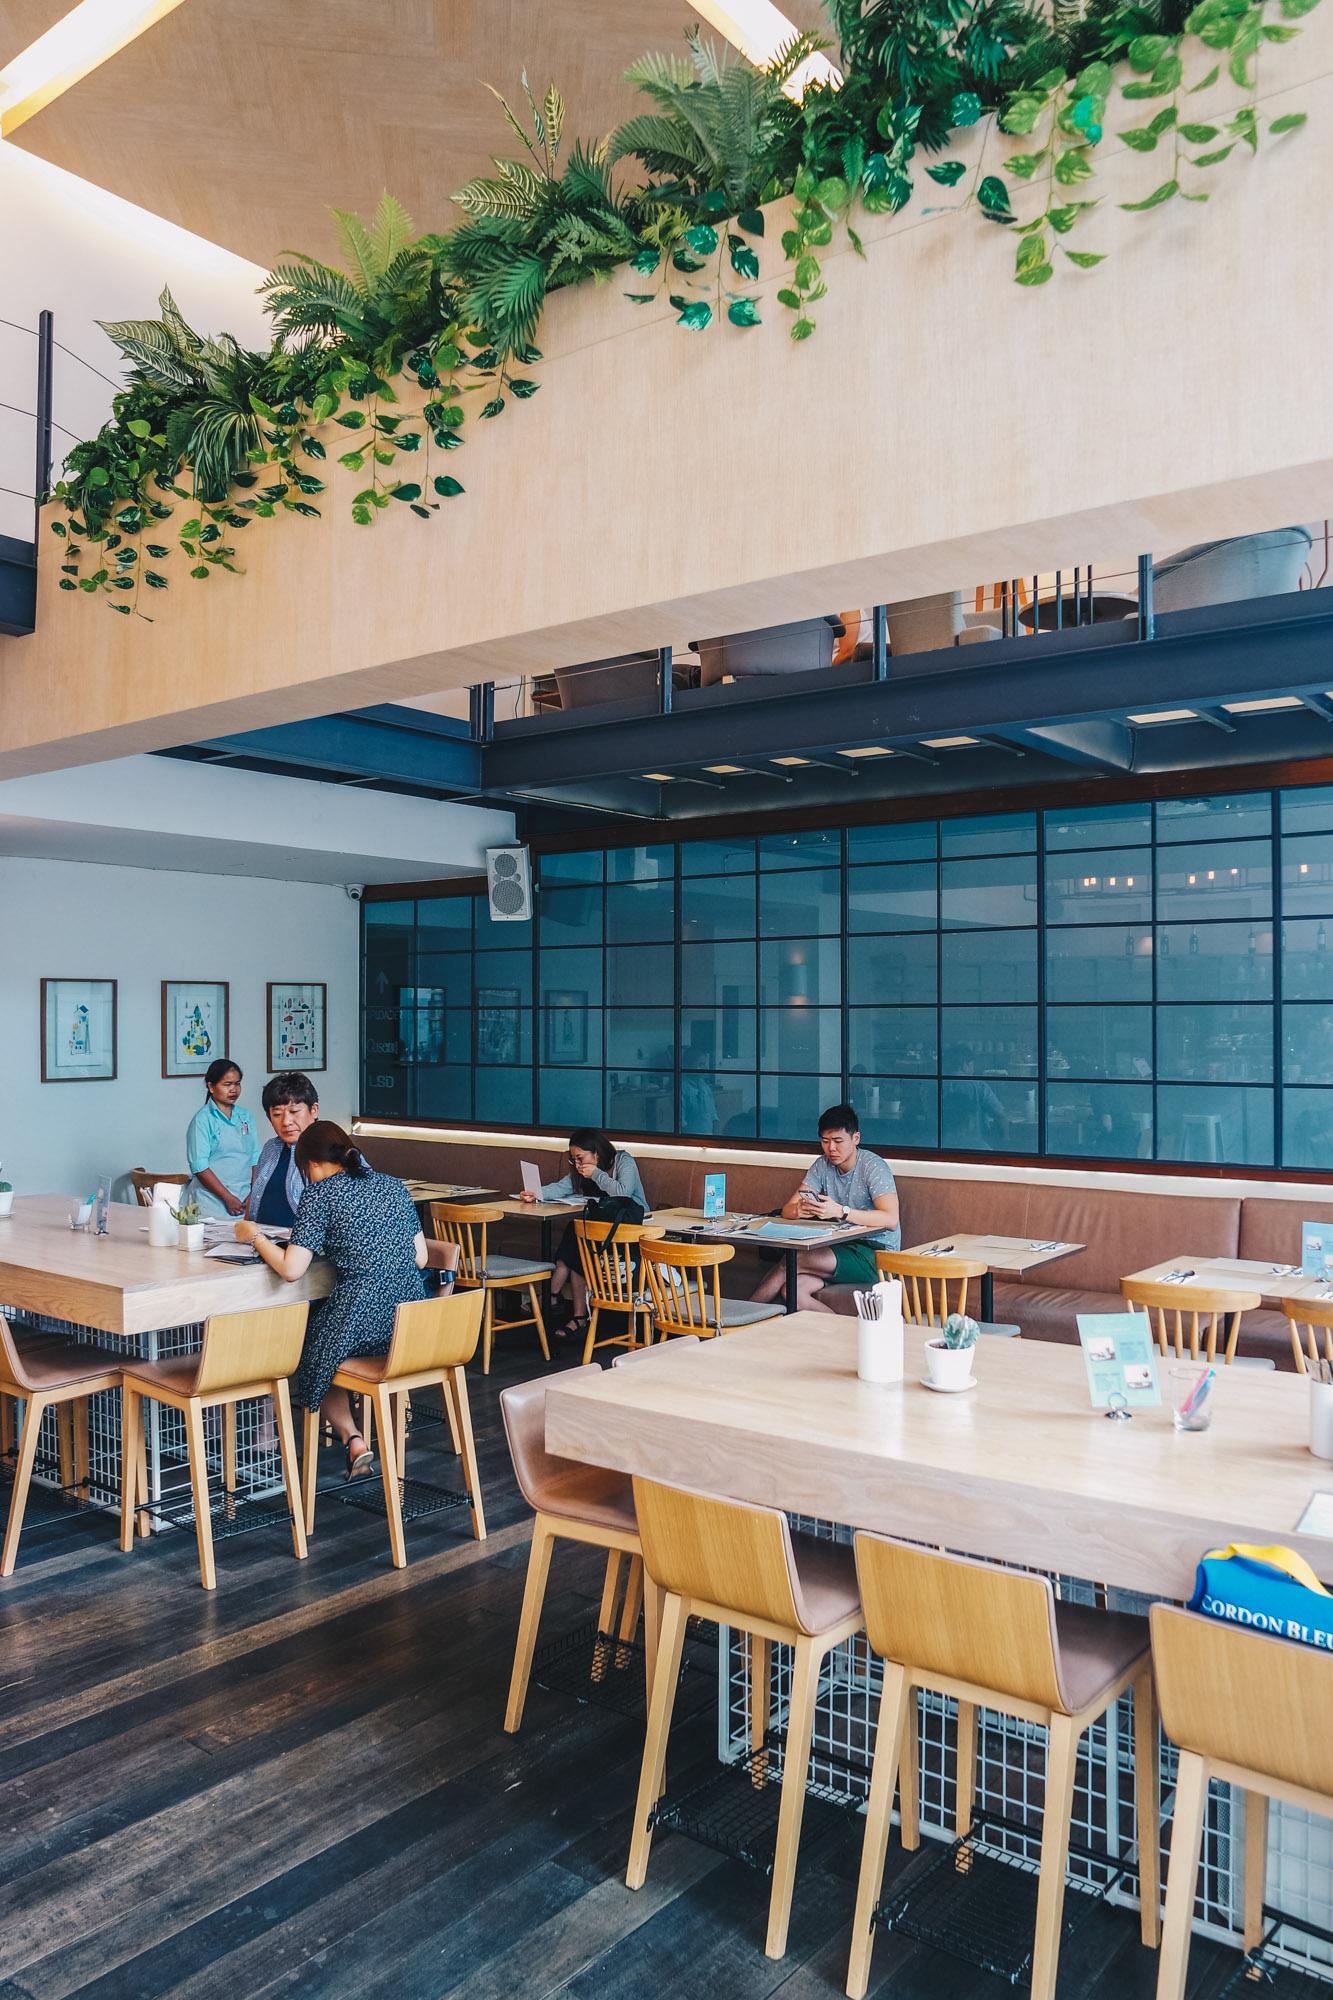 Rocket Coffee Bar on Sukhumvit Soi 49 Bangkok